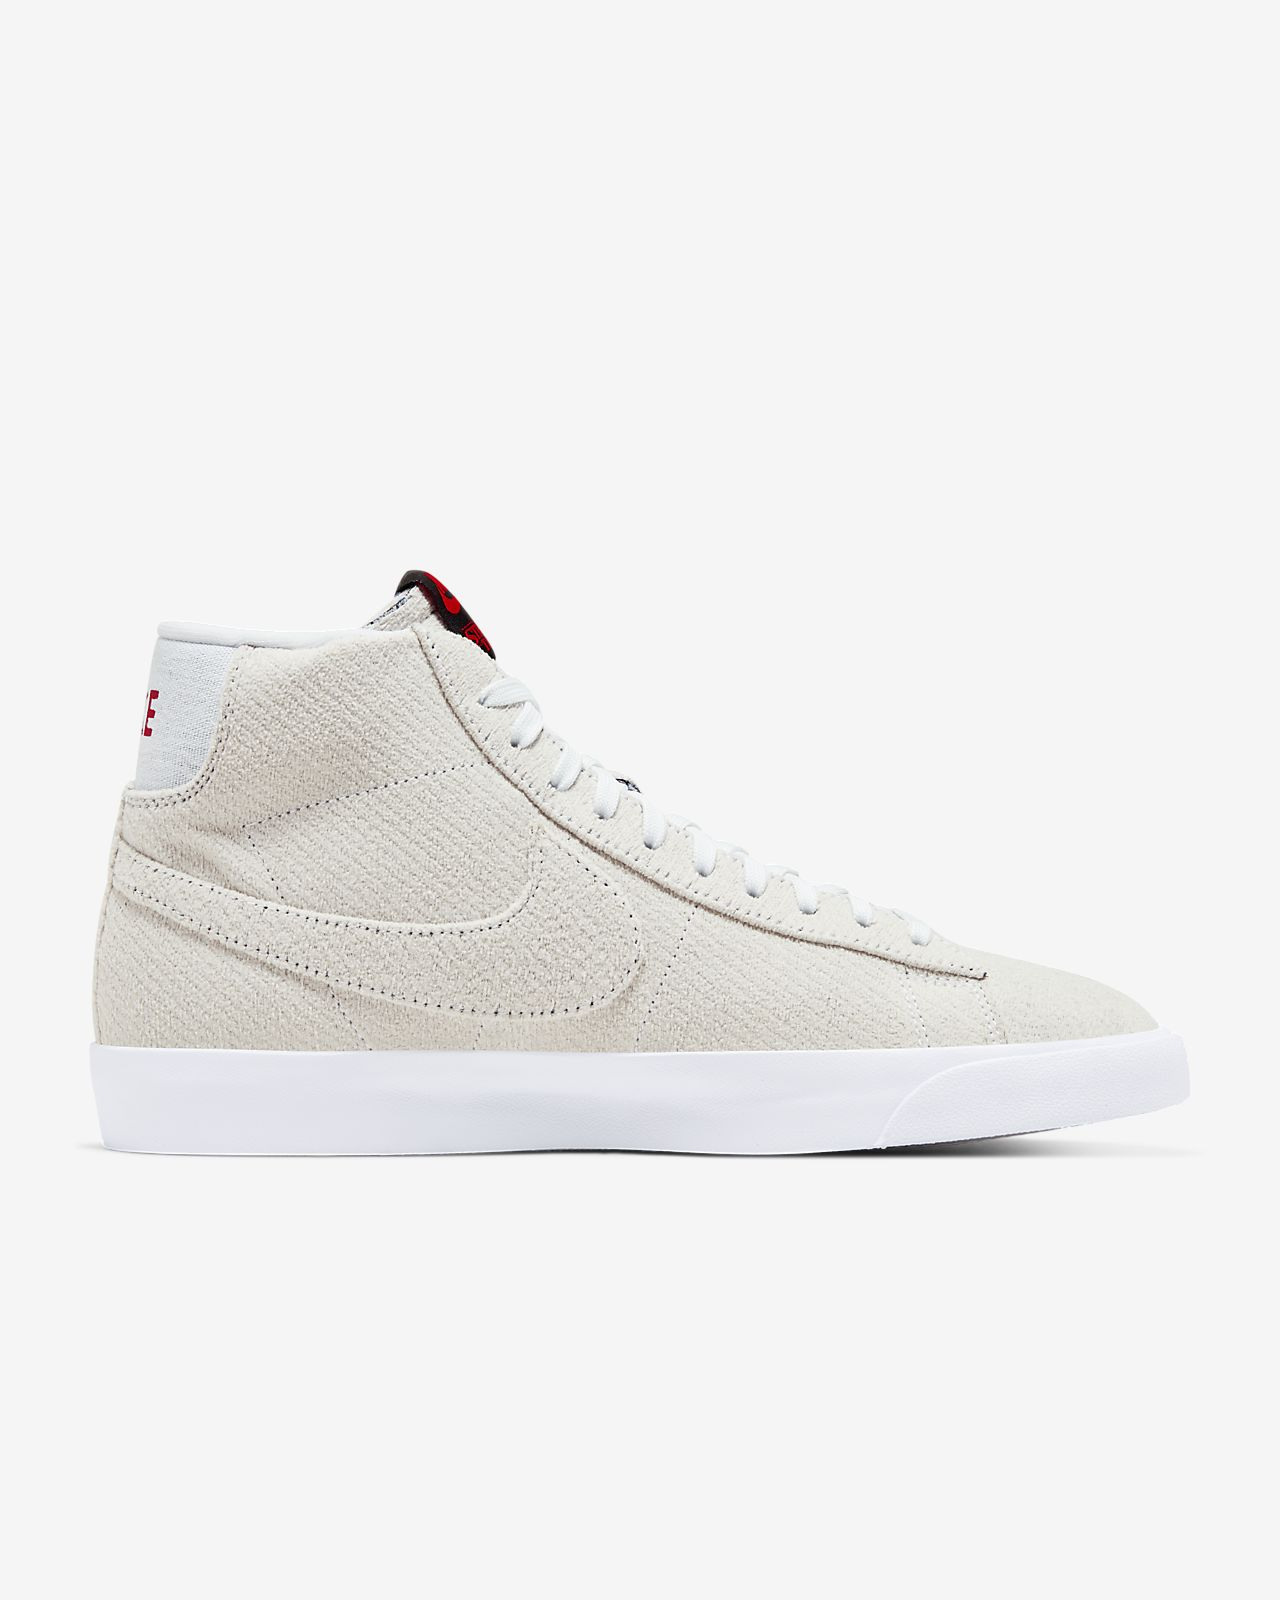 Nike x Stranger Things Blazer Mid 'Upside Down' Men's Shoe